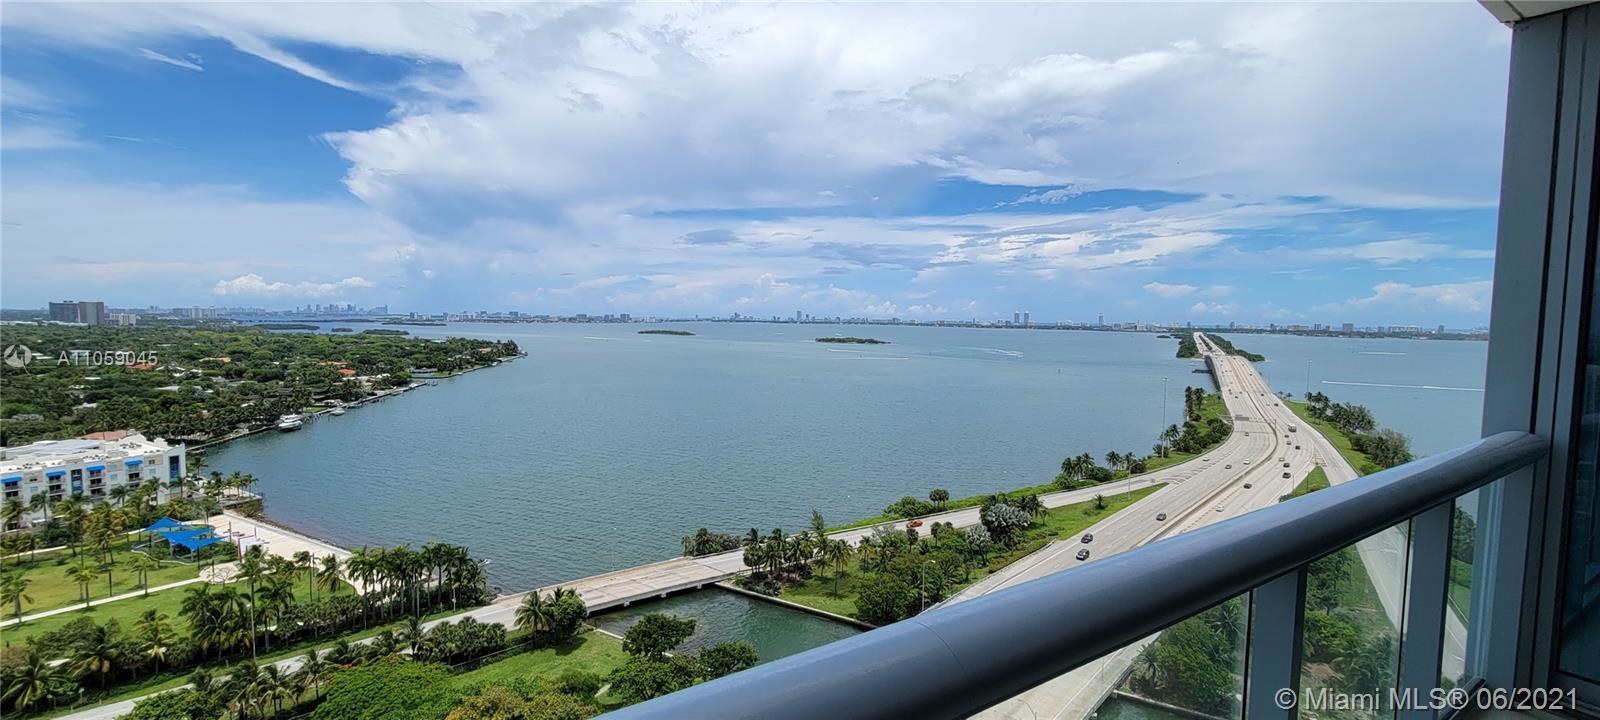 Blue on the Bay #2009 - 601 NE 36 ST #2009, Miami, FL 33137